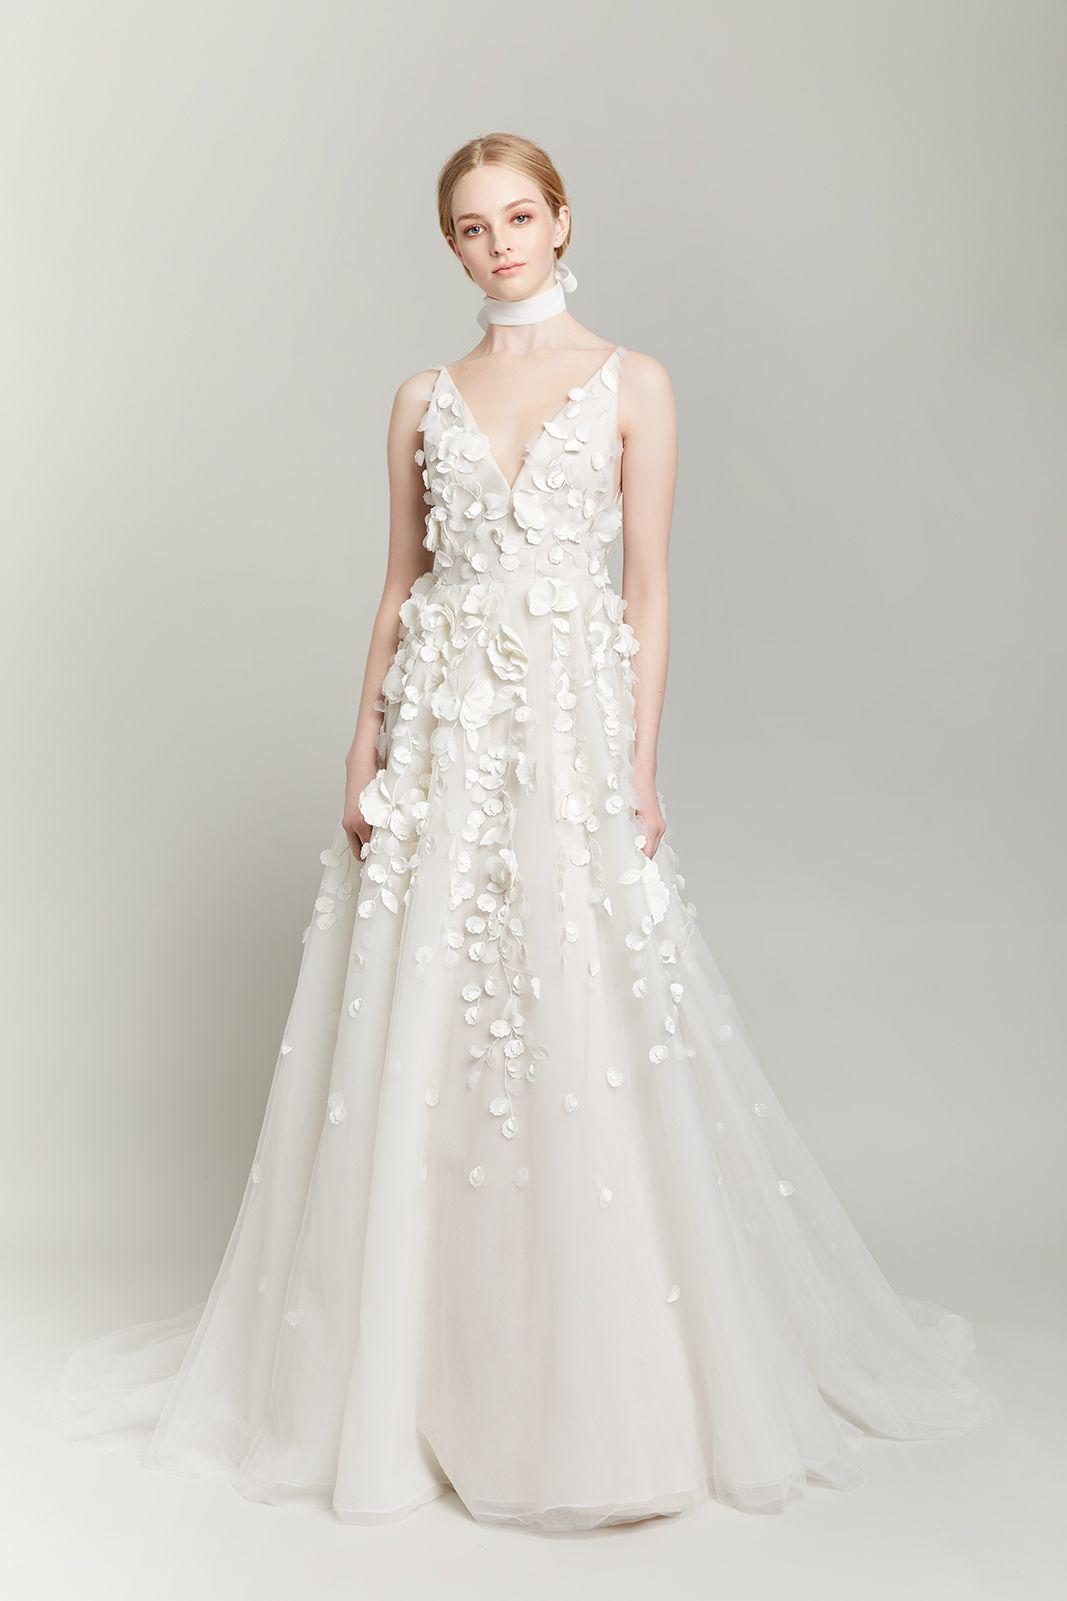 Pin On Lela Rose Spring 2019 Bridal Lookbook Images